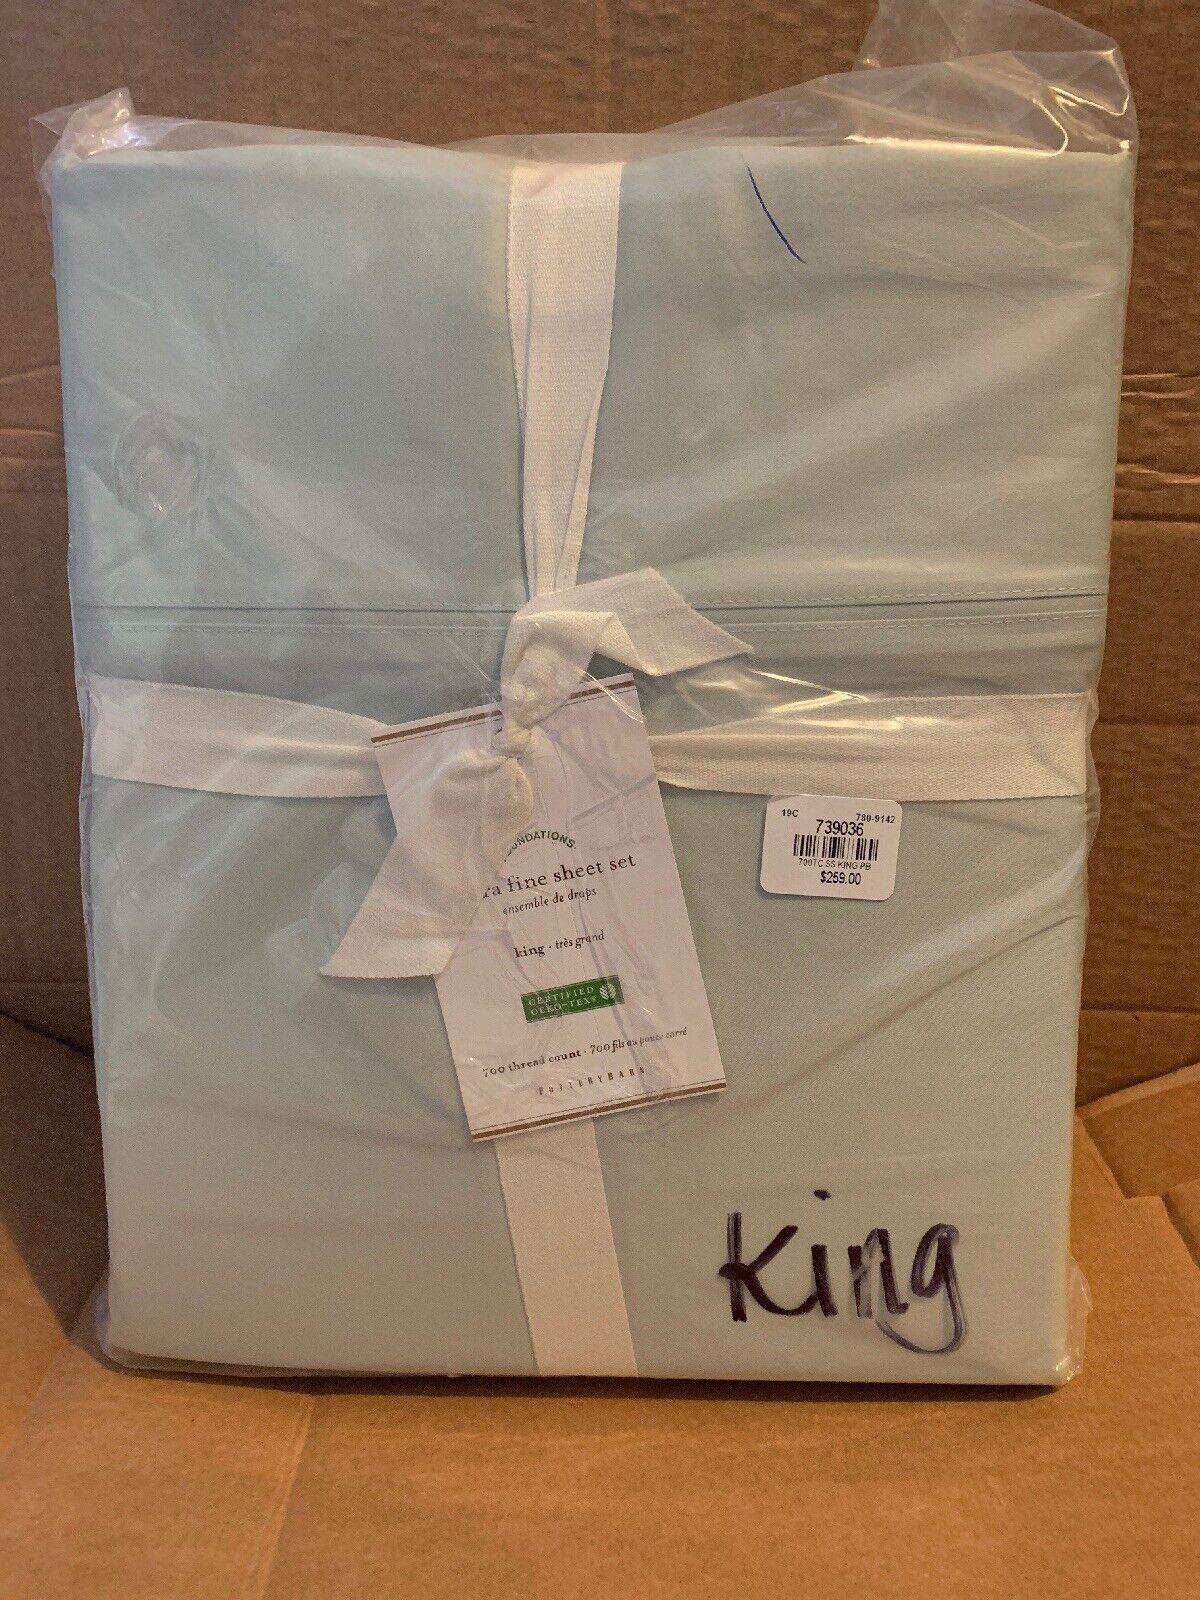 New Pottery Barn Ultra Fine King  Sheet Set 700-Thread Count Porcelain bluee  259